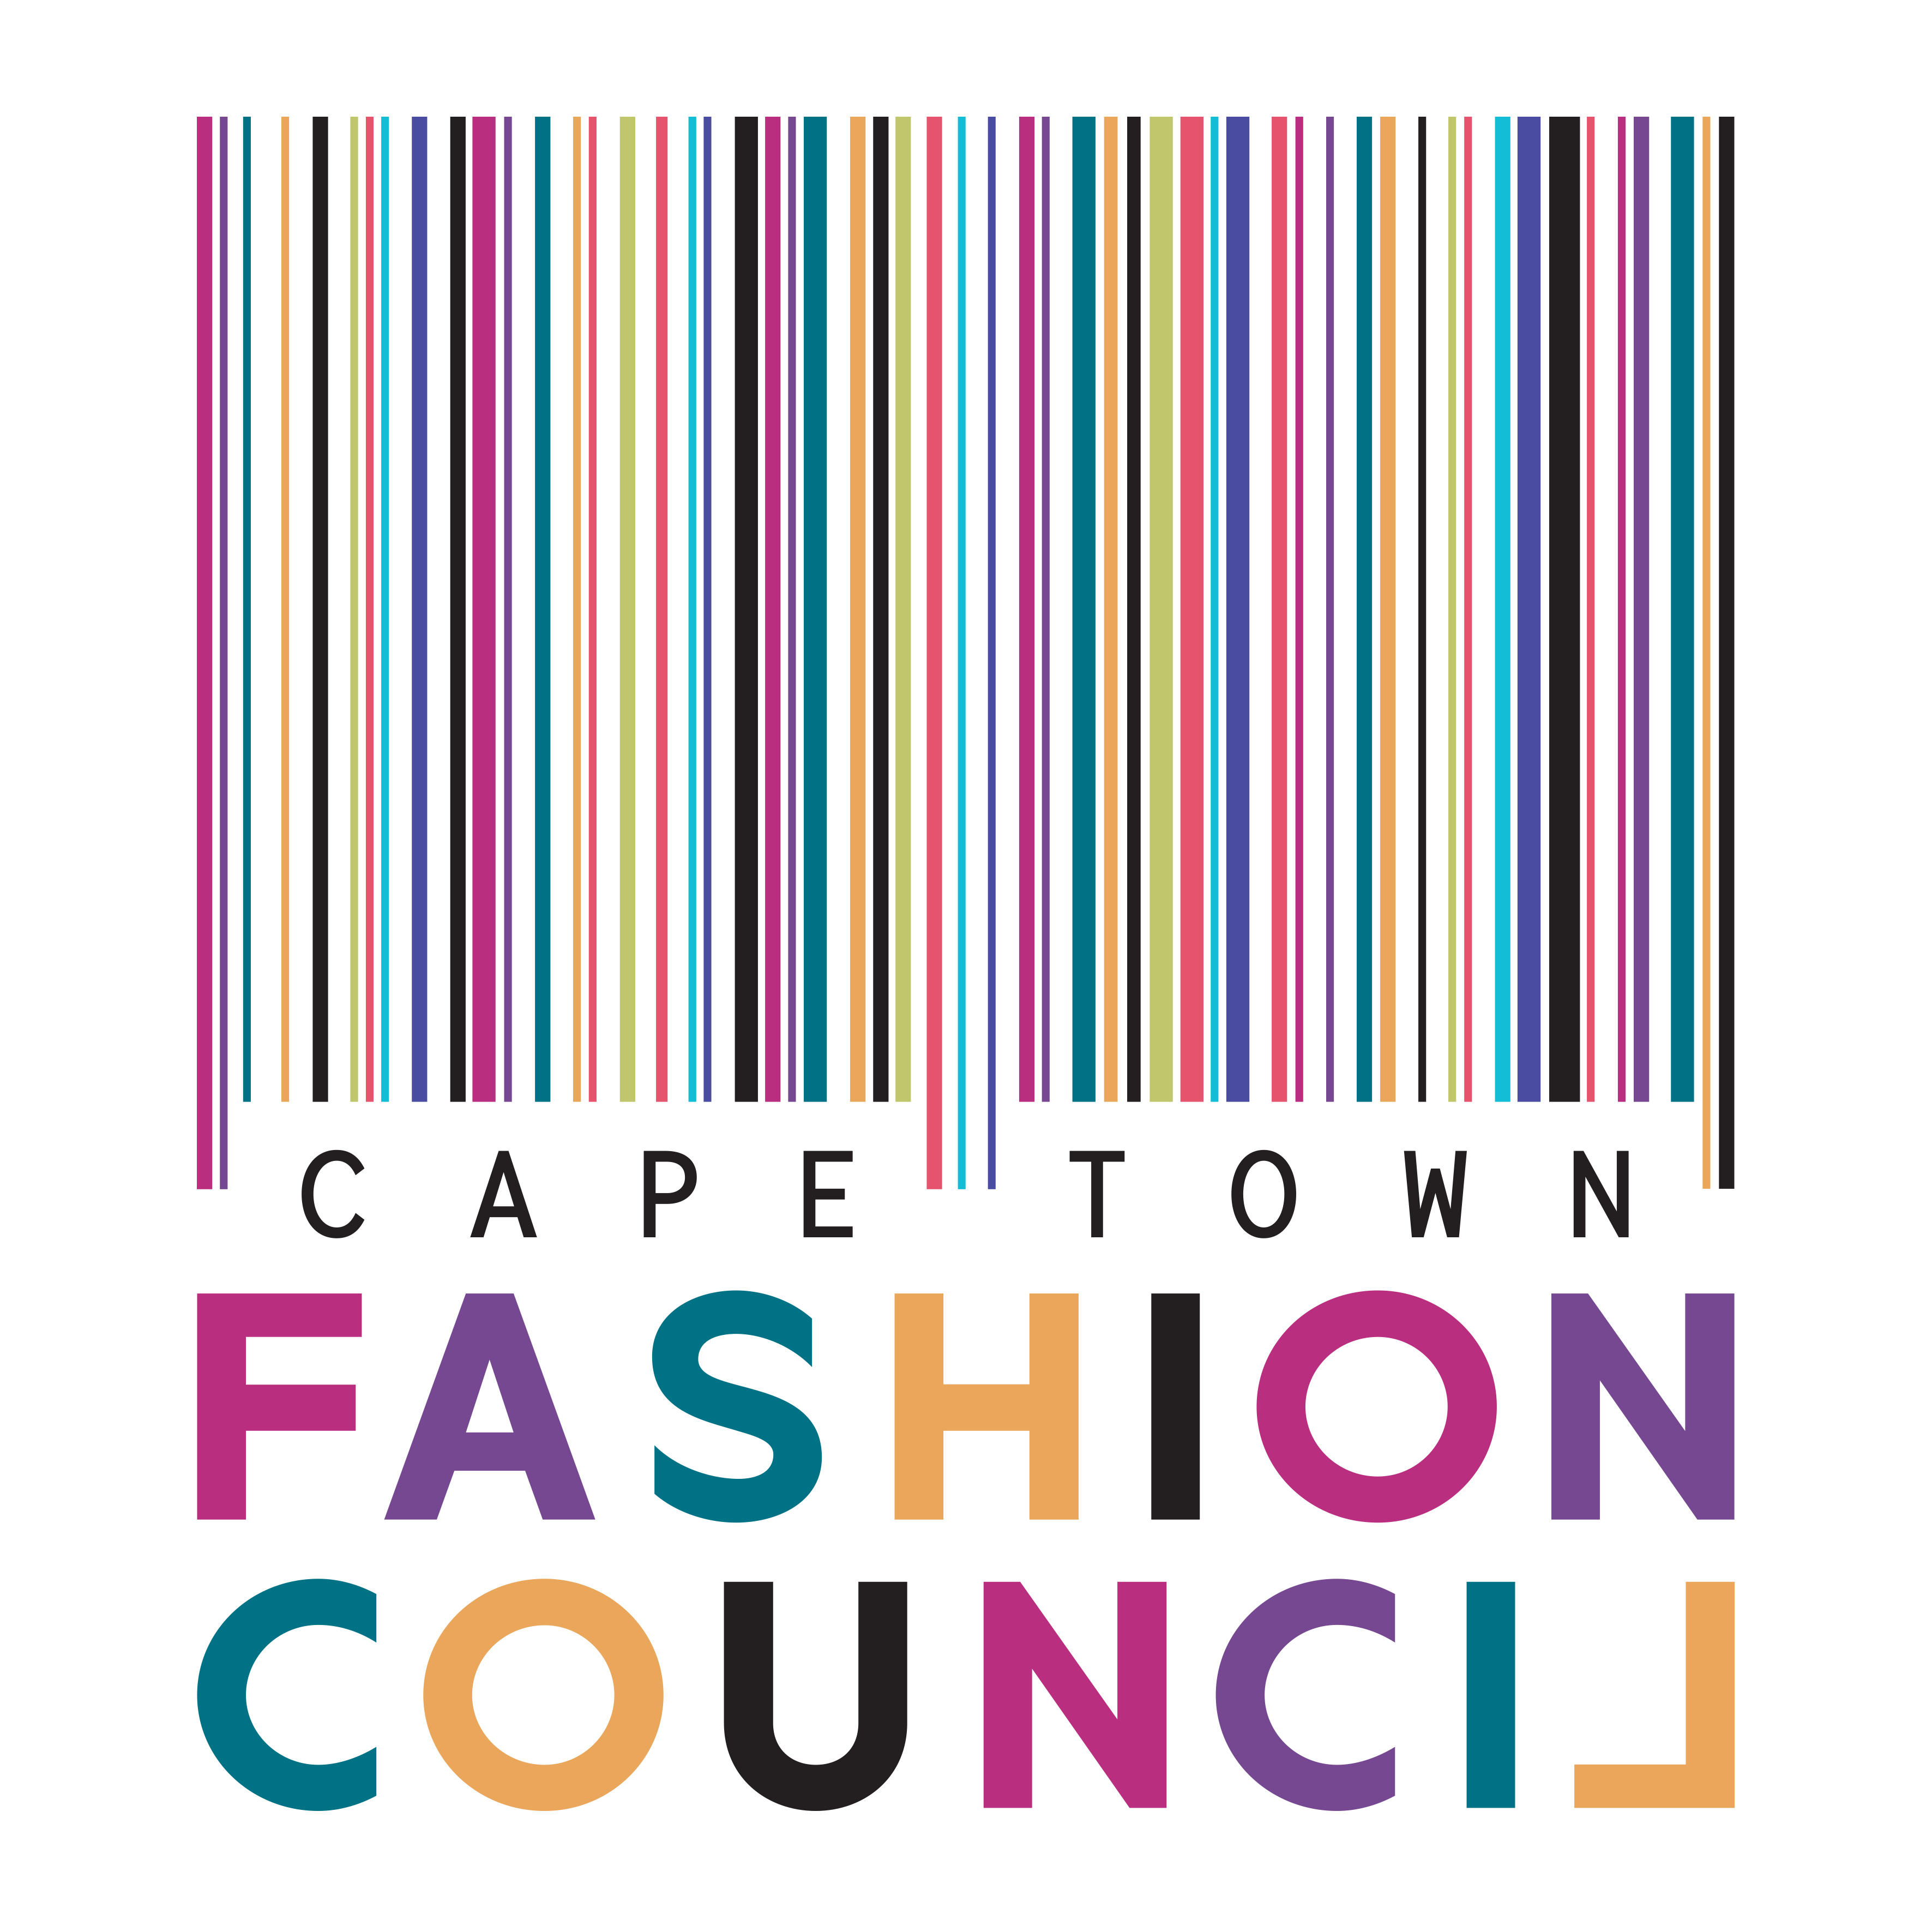 Fashion Council Logo